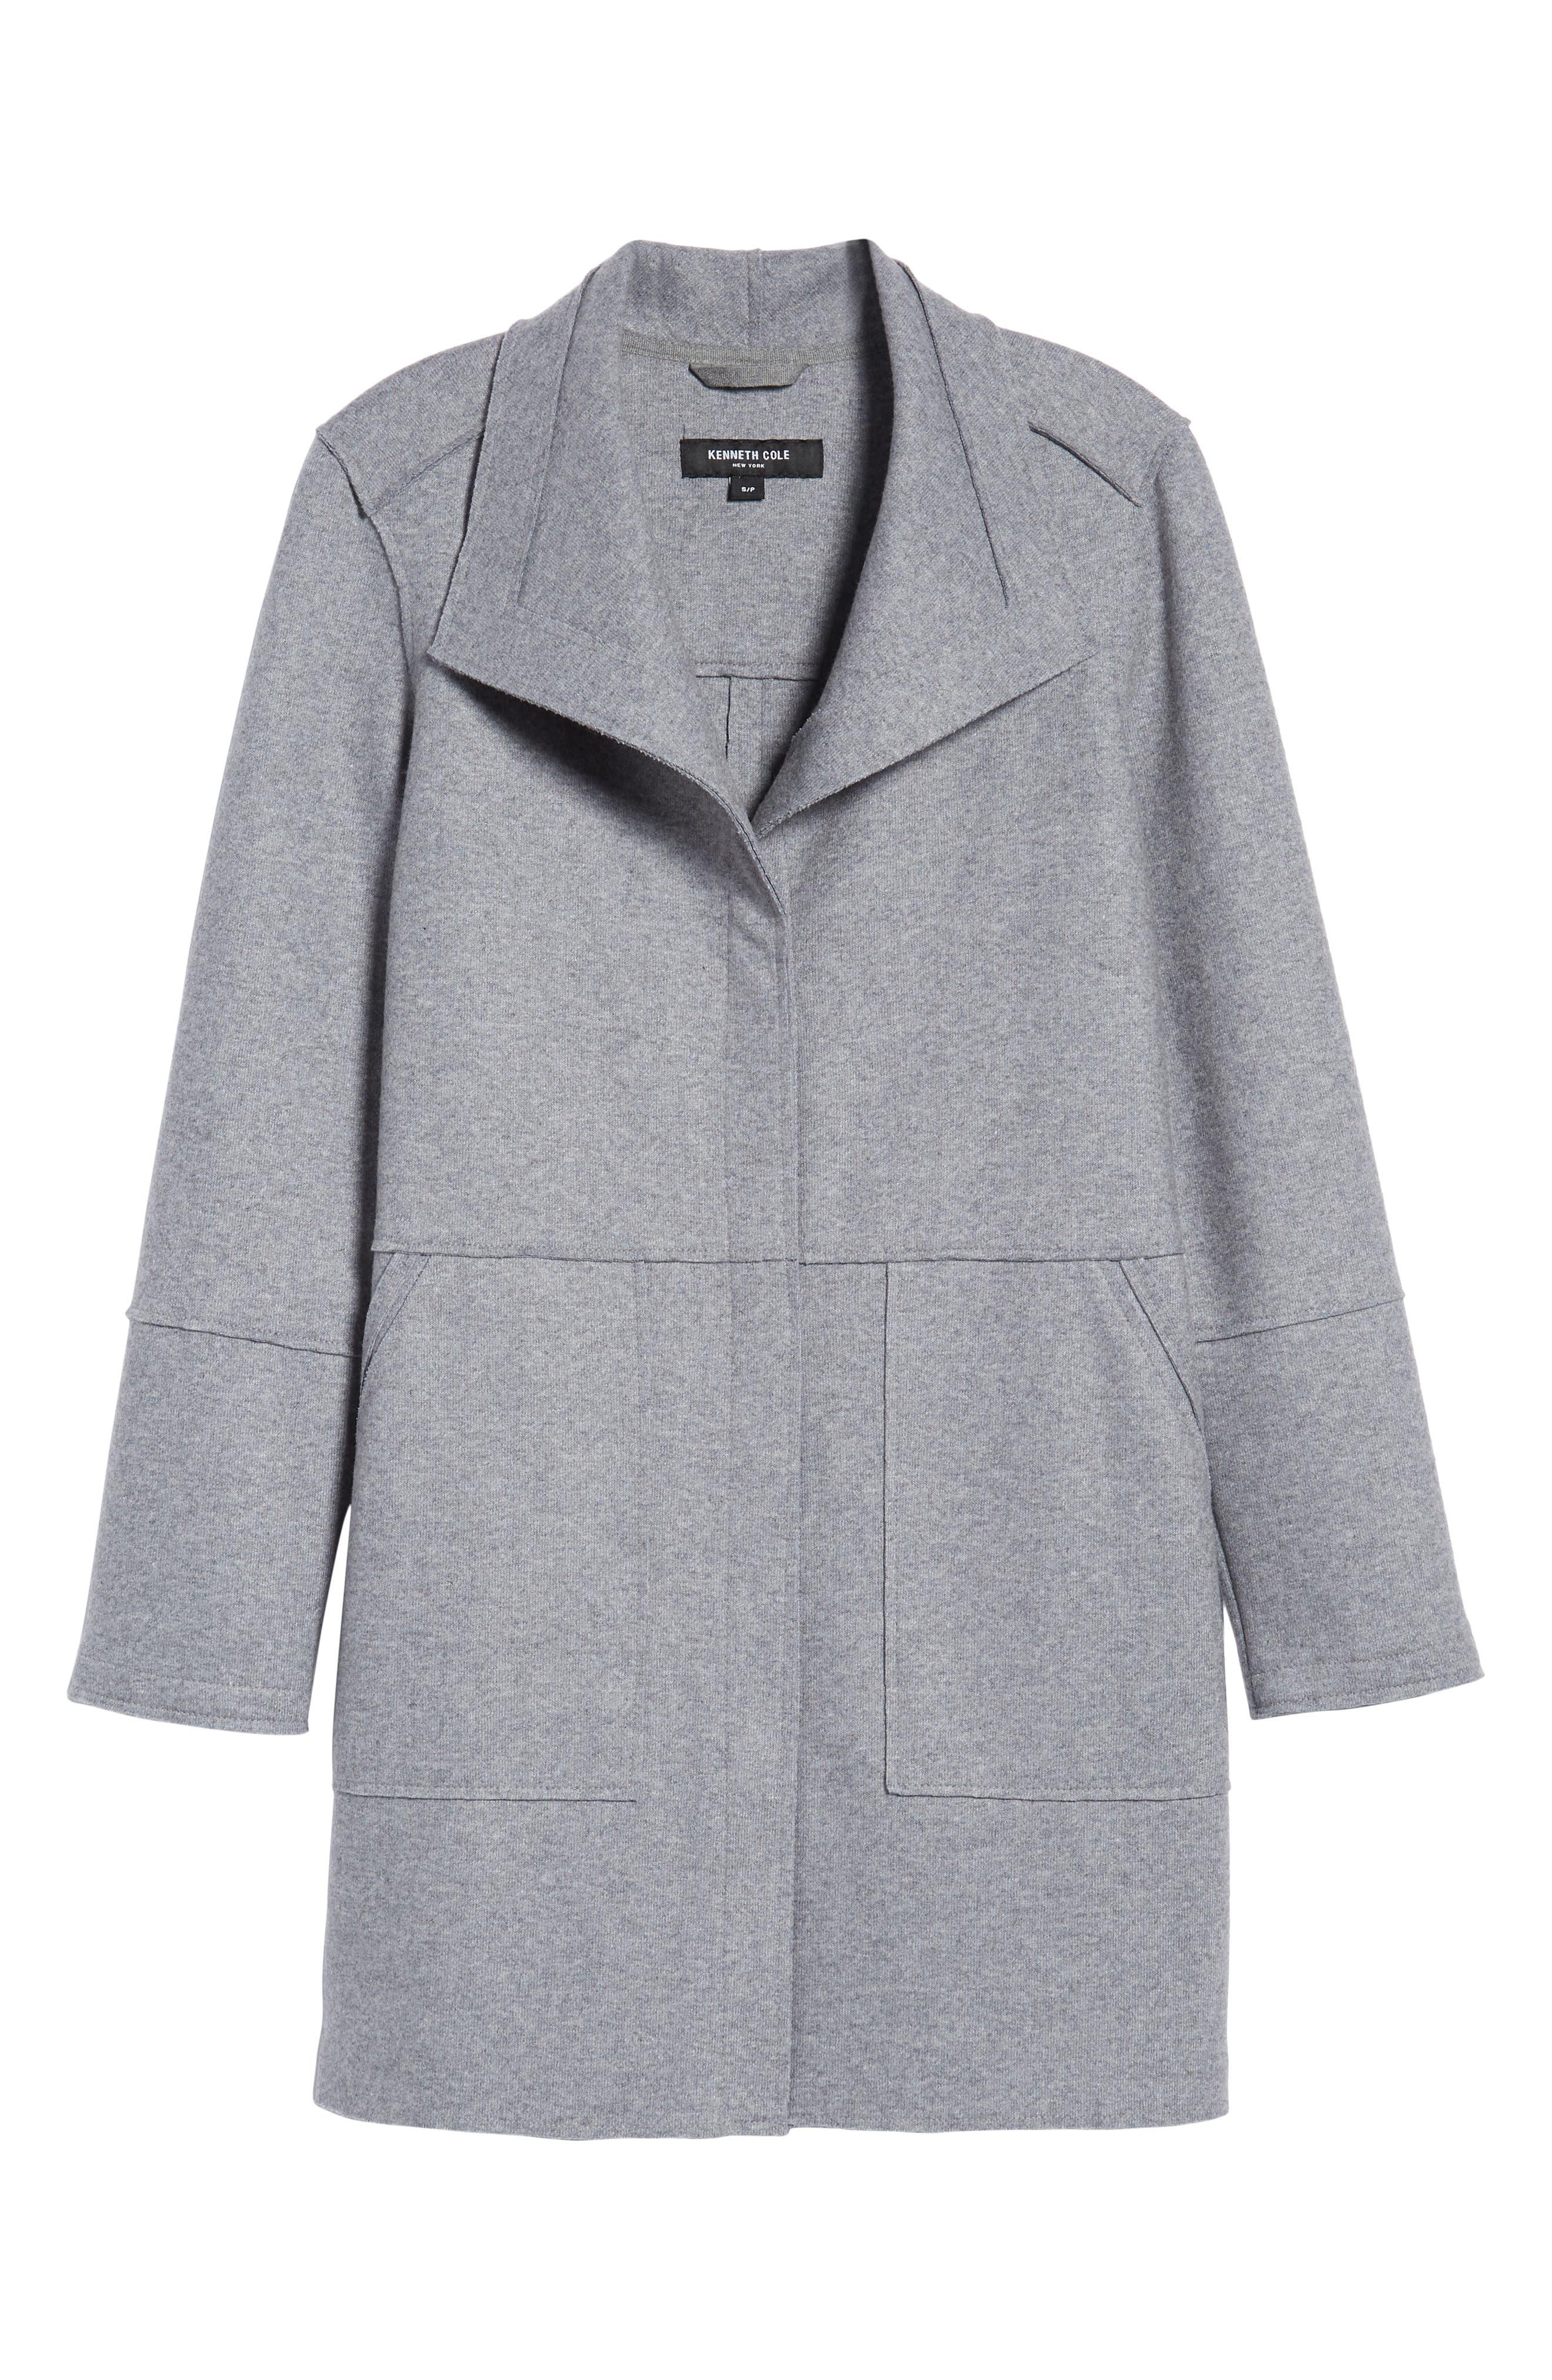 Envelope Collar Wool Blend Knit Coat,                             Alternate thumbnail 6, color,                             LIGHT GREY